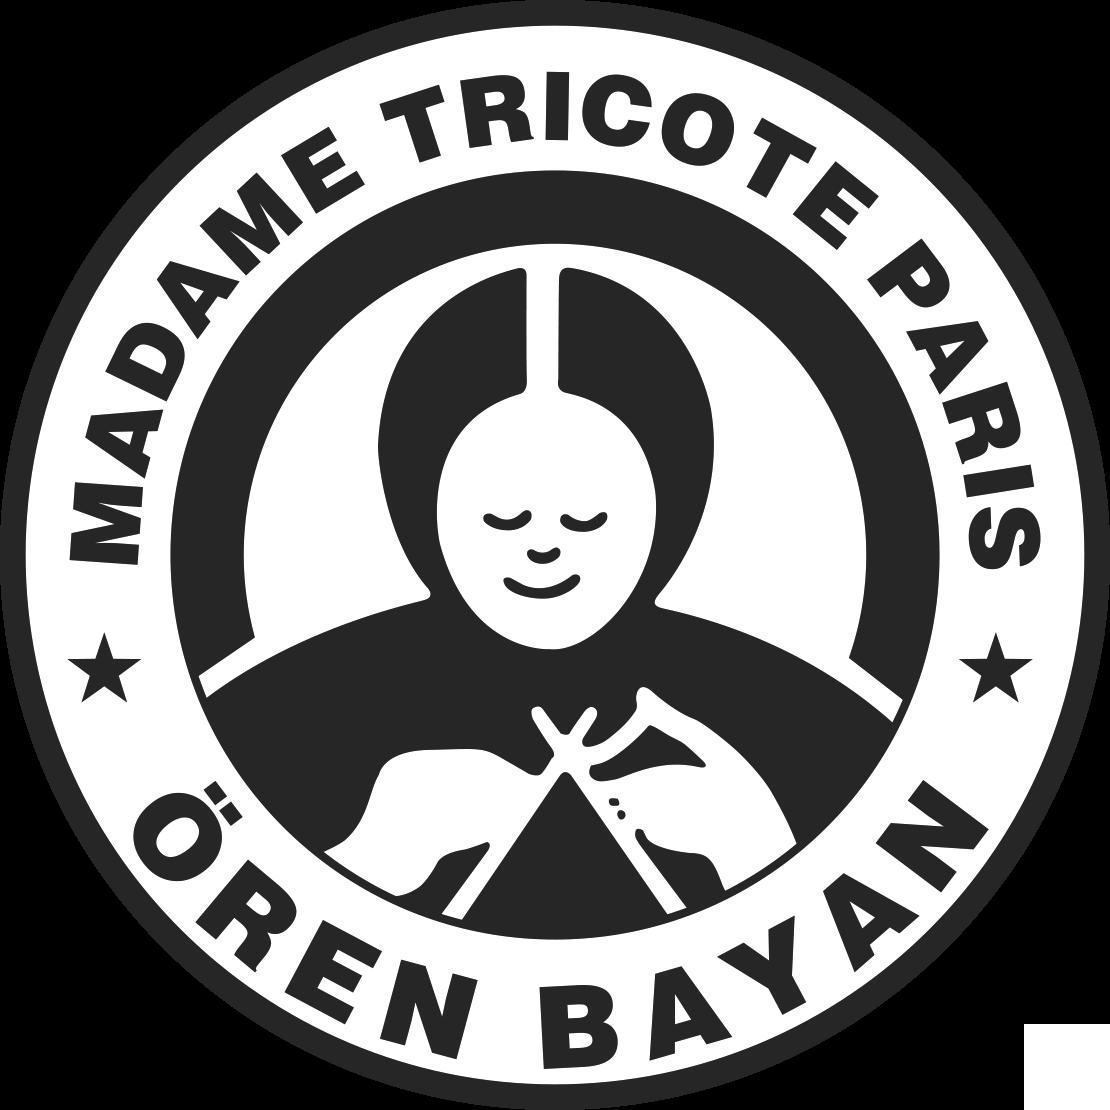 MADAME TRICOTE PARIS - OREN BAYAN